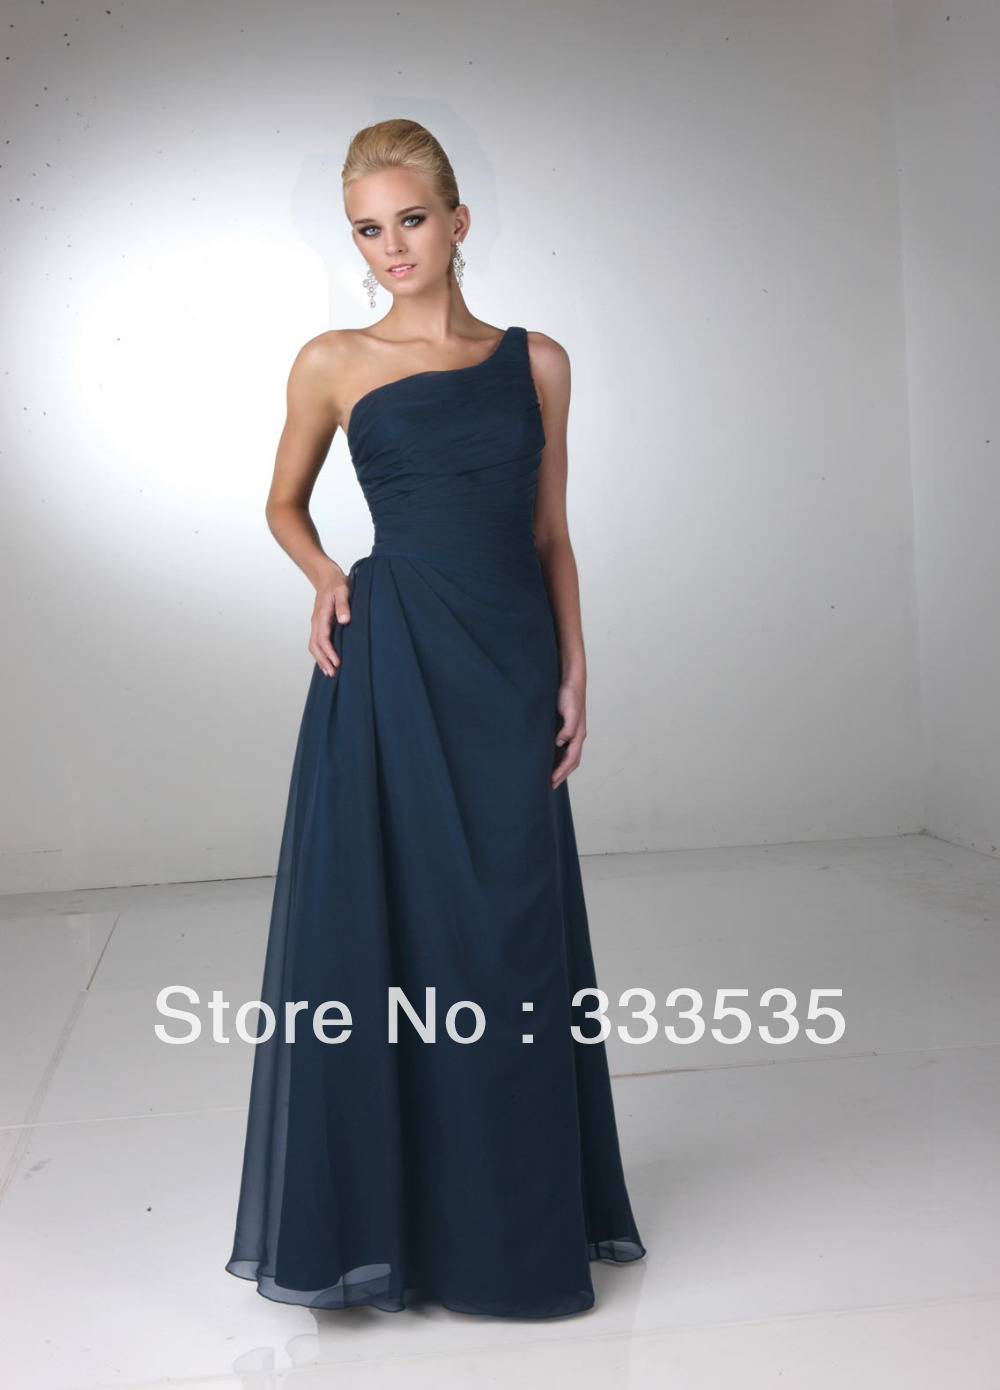 Navy Blue Bridesmaid Dress Floor Length High Neck Chiffon ...